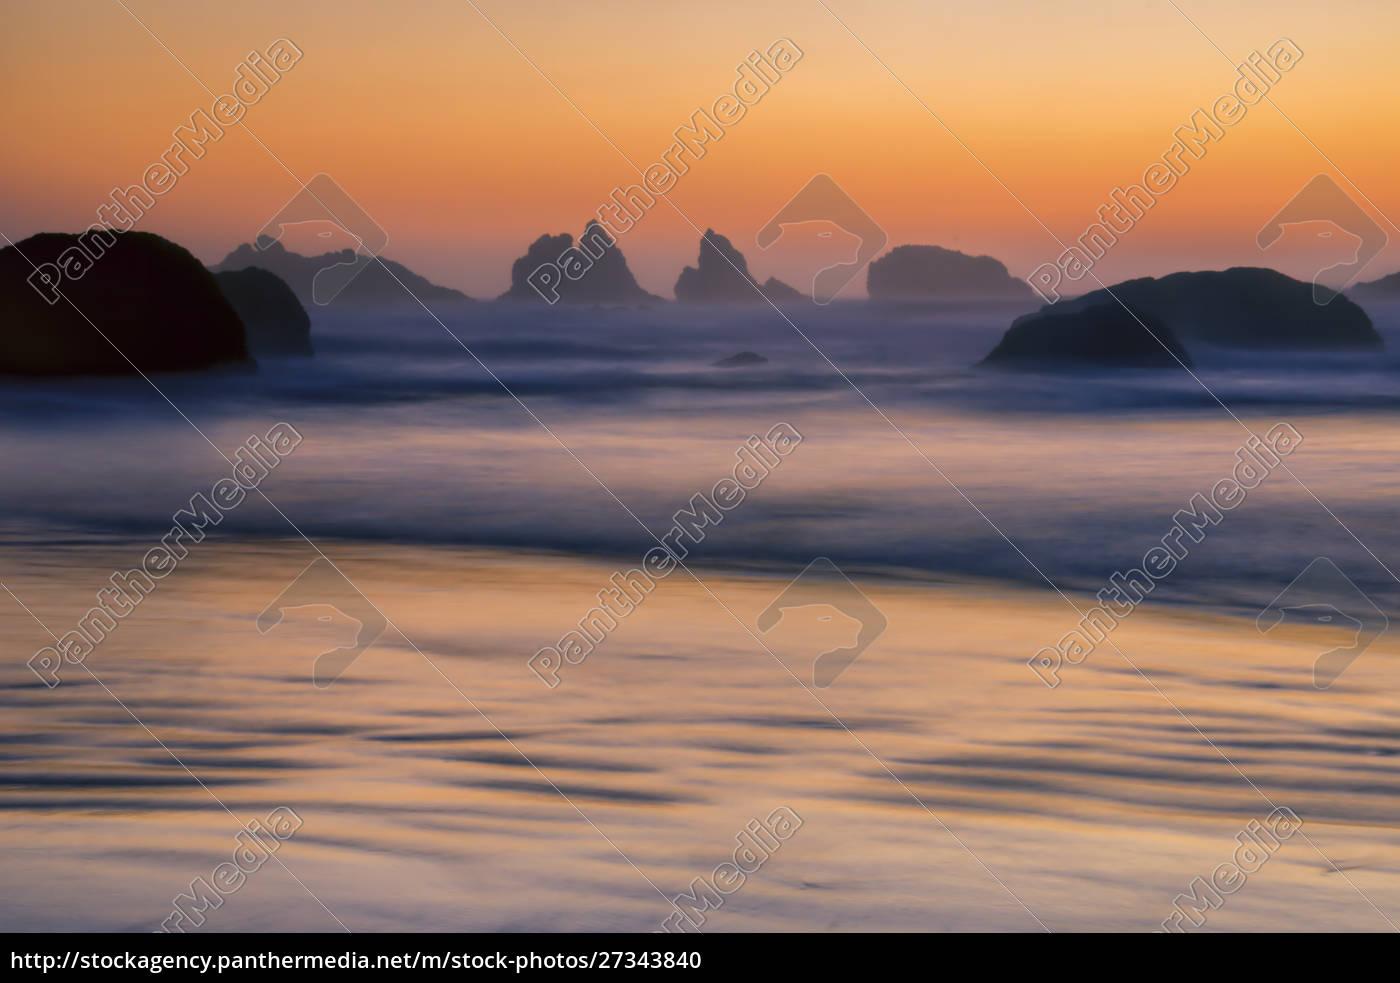 usa, , oregon, , bandon., beach, sunset. - 27343840